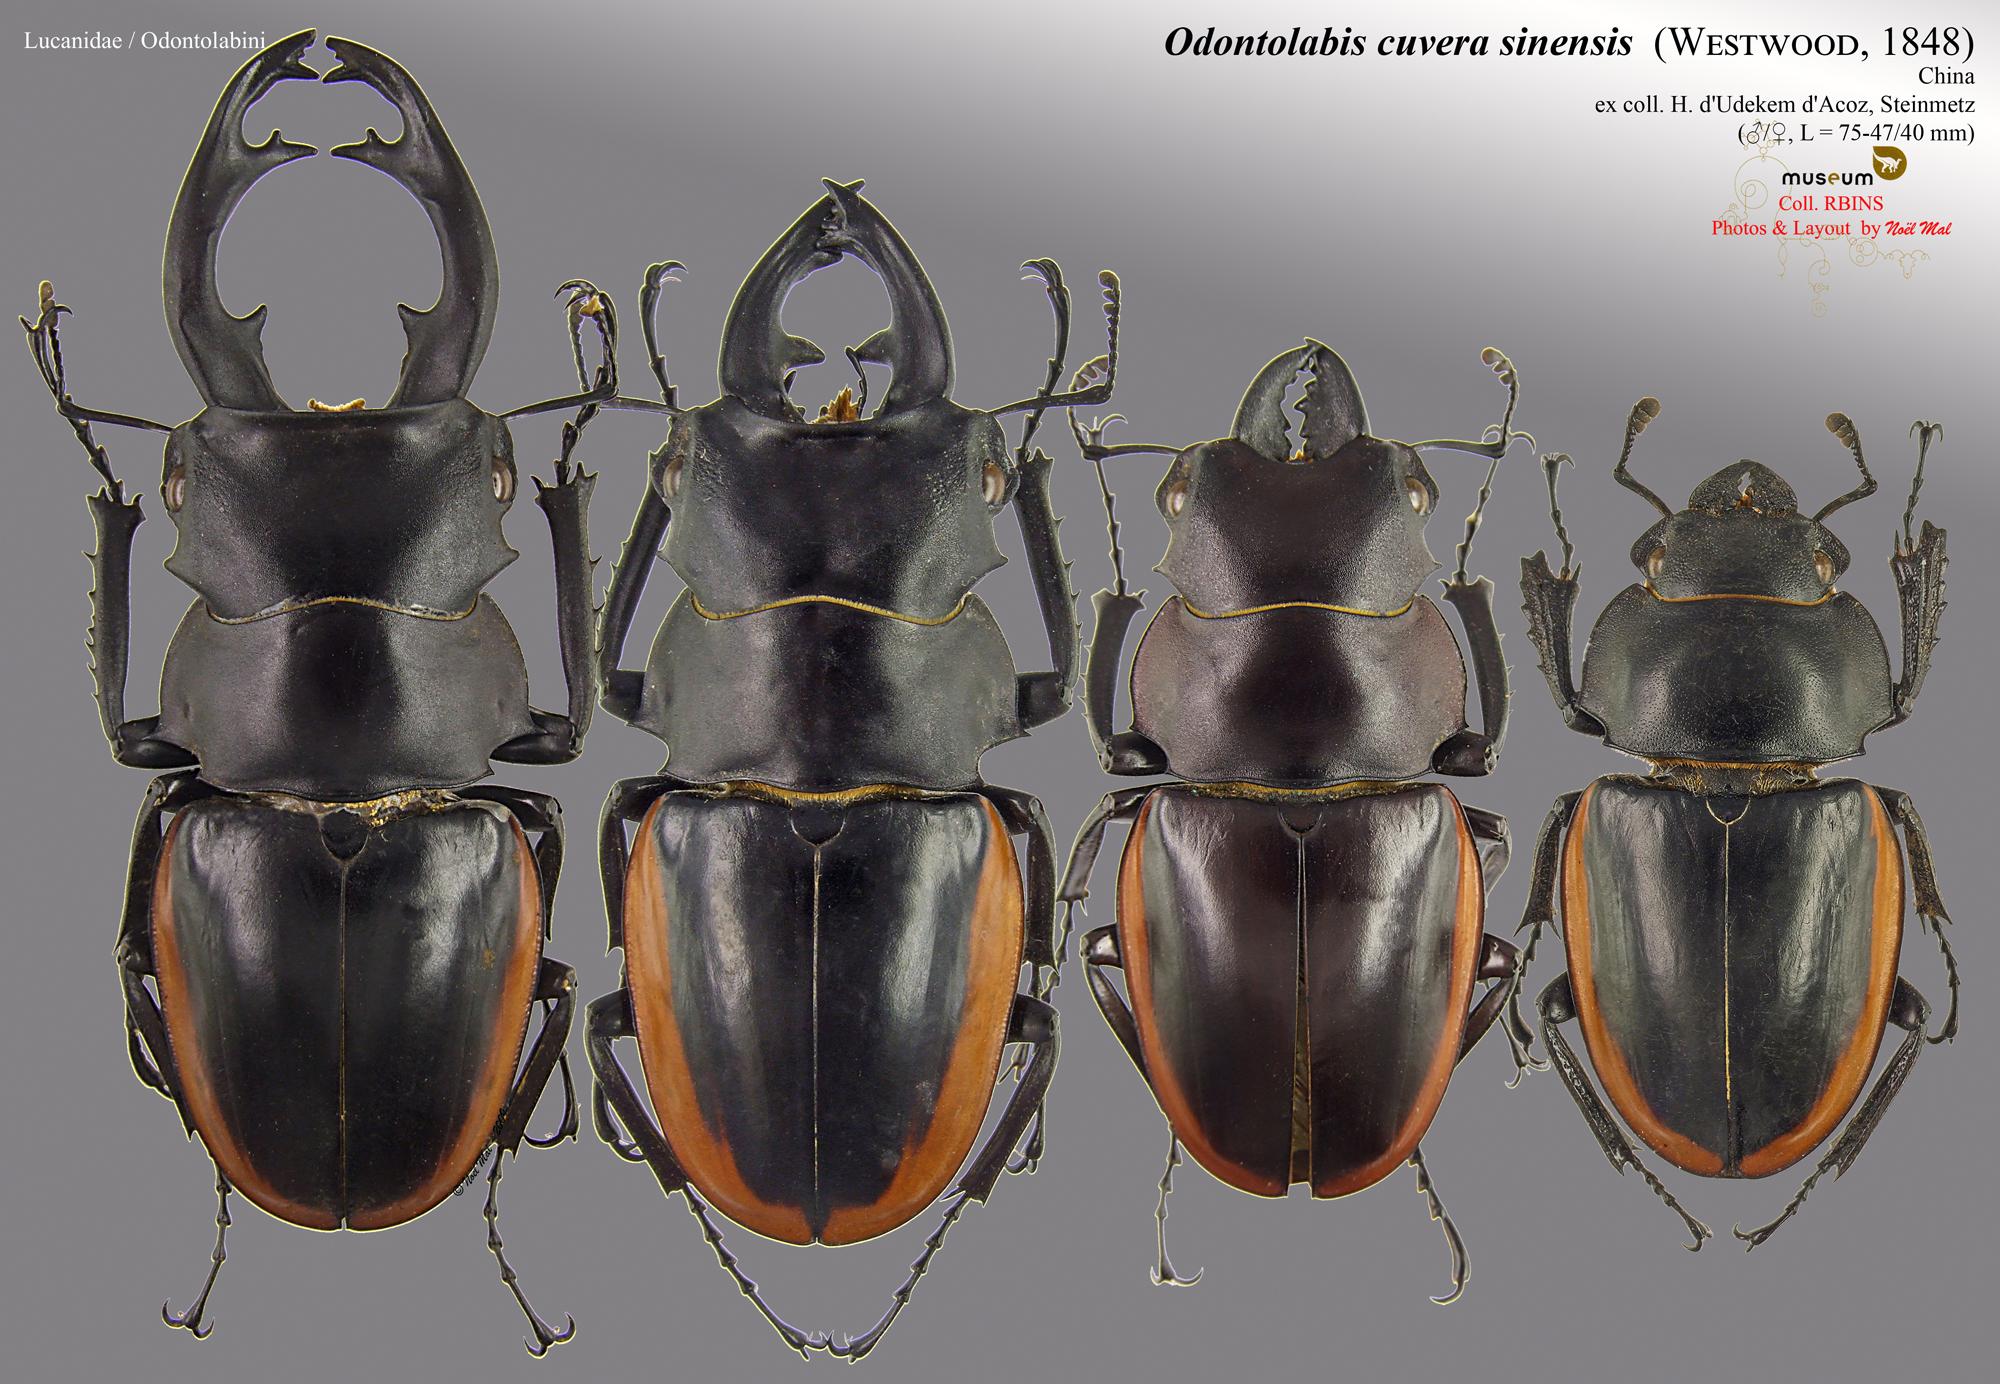 Odontolabis cuvera sinensis.jpg